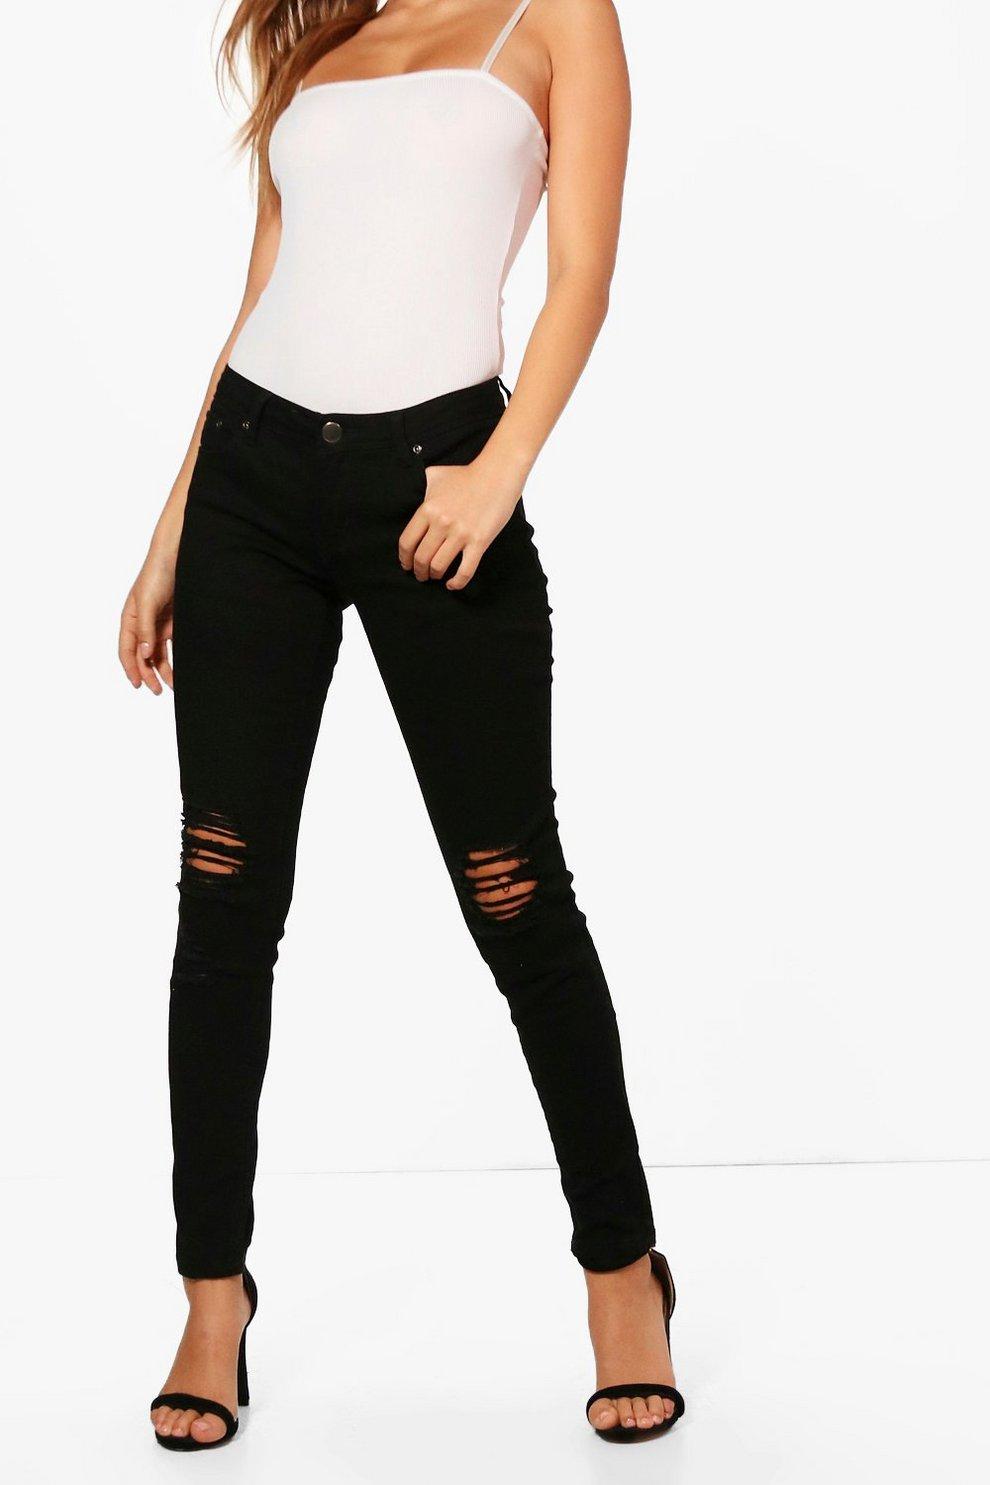 Laura Ripped Knee Black Skinny Jeans | Boohoo